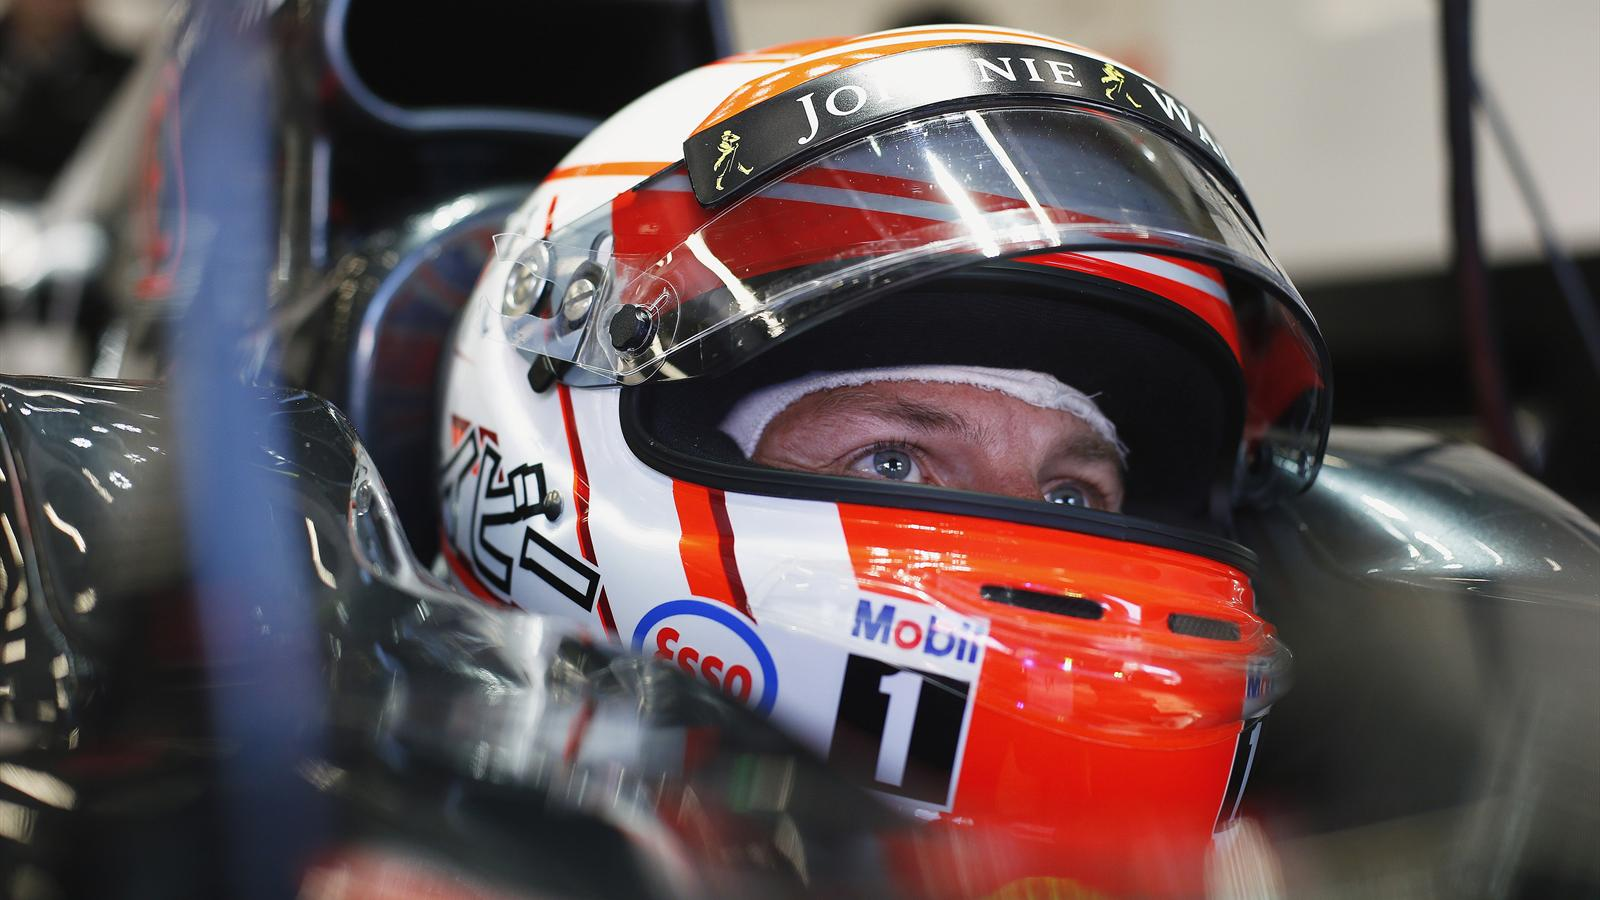 Jenson Button (McLaren) - GP of Italy 2015